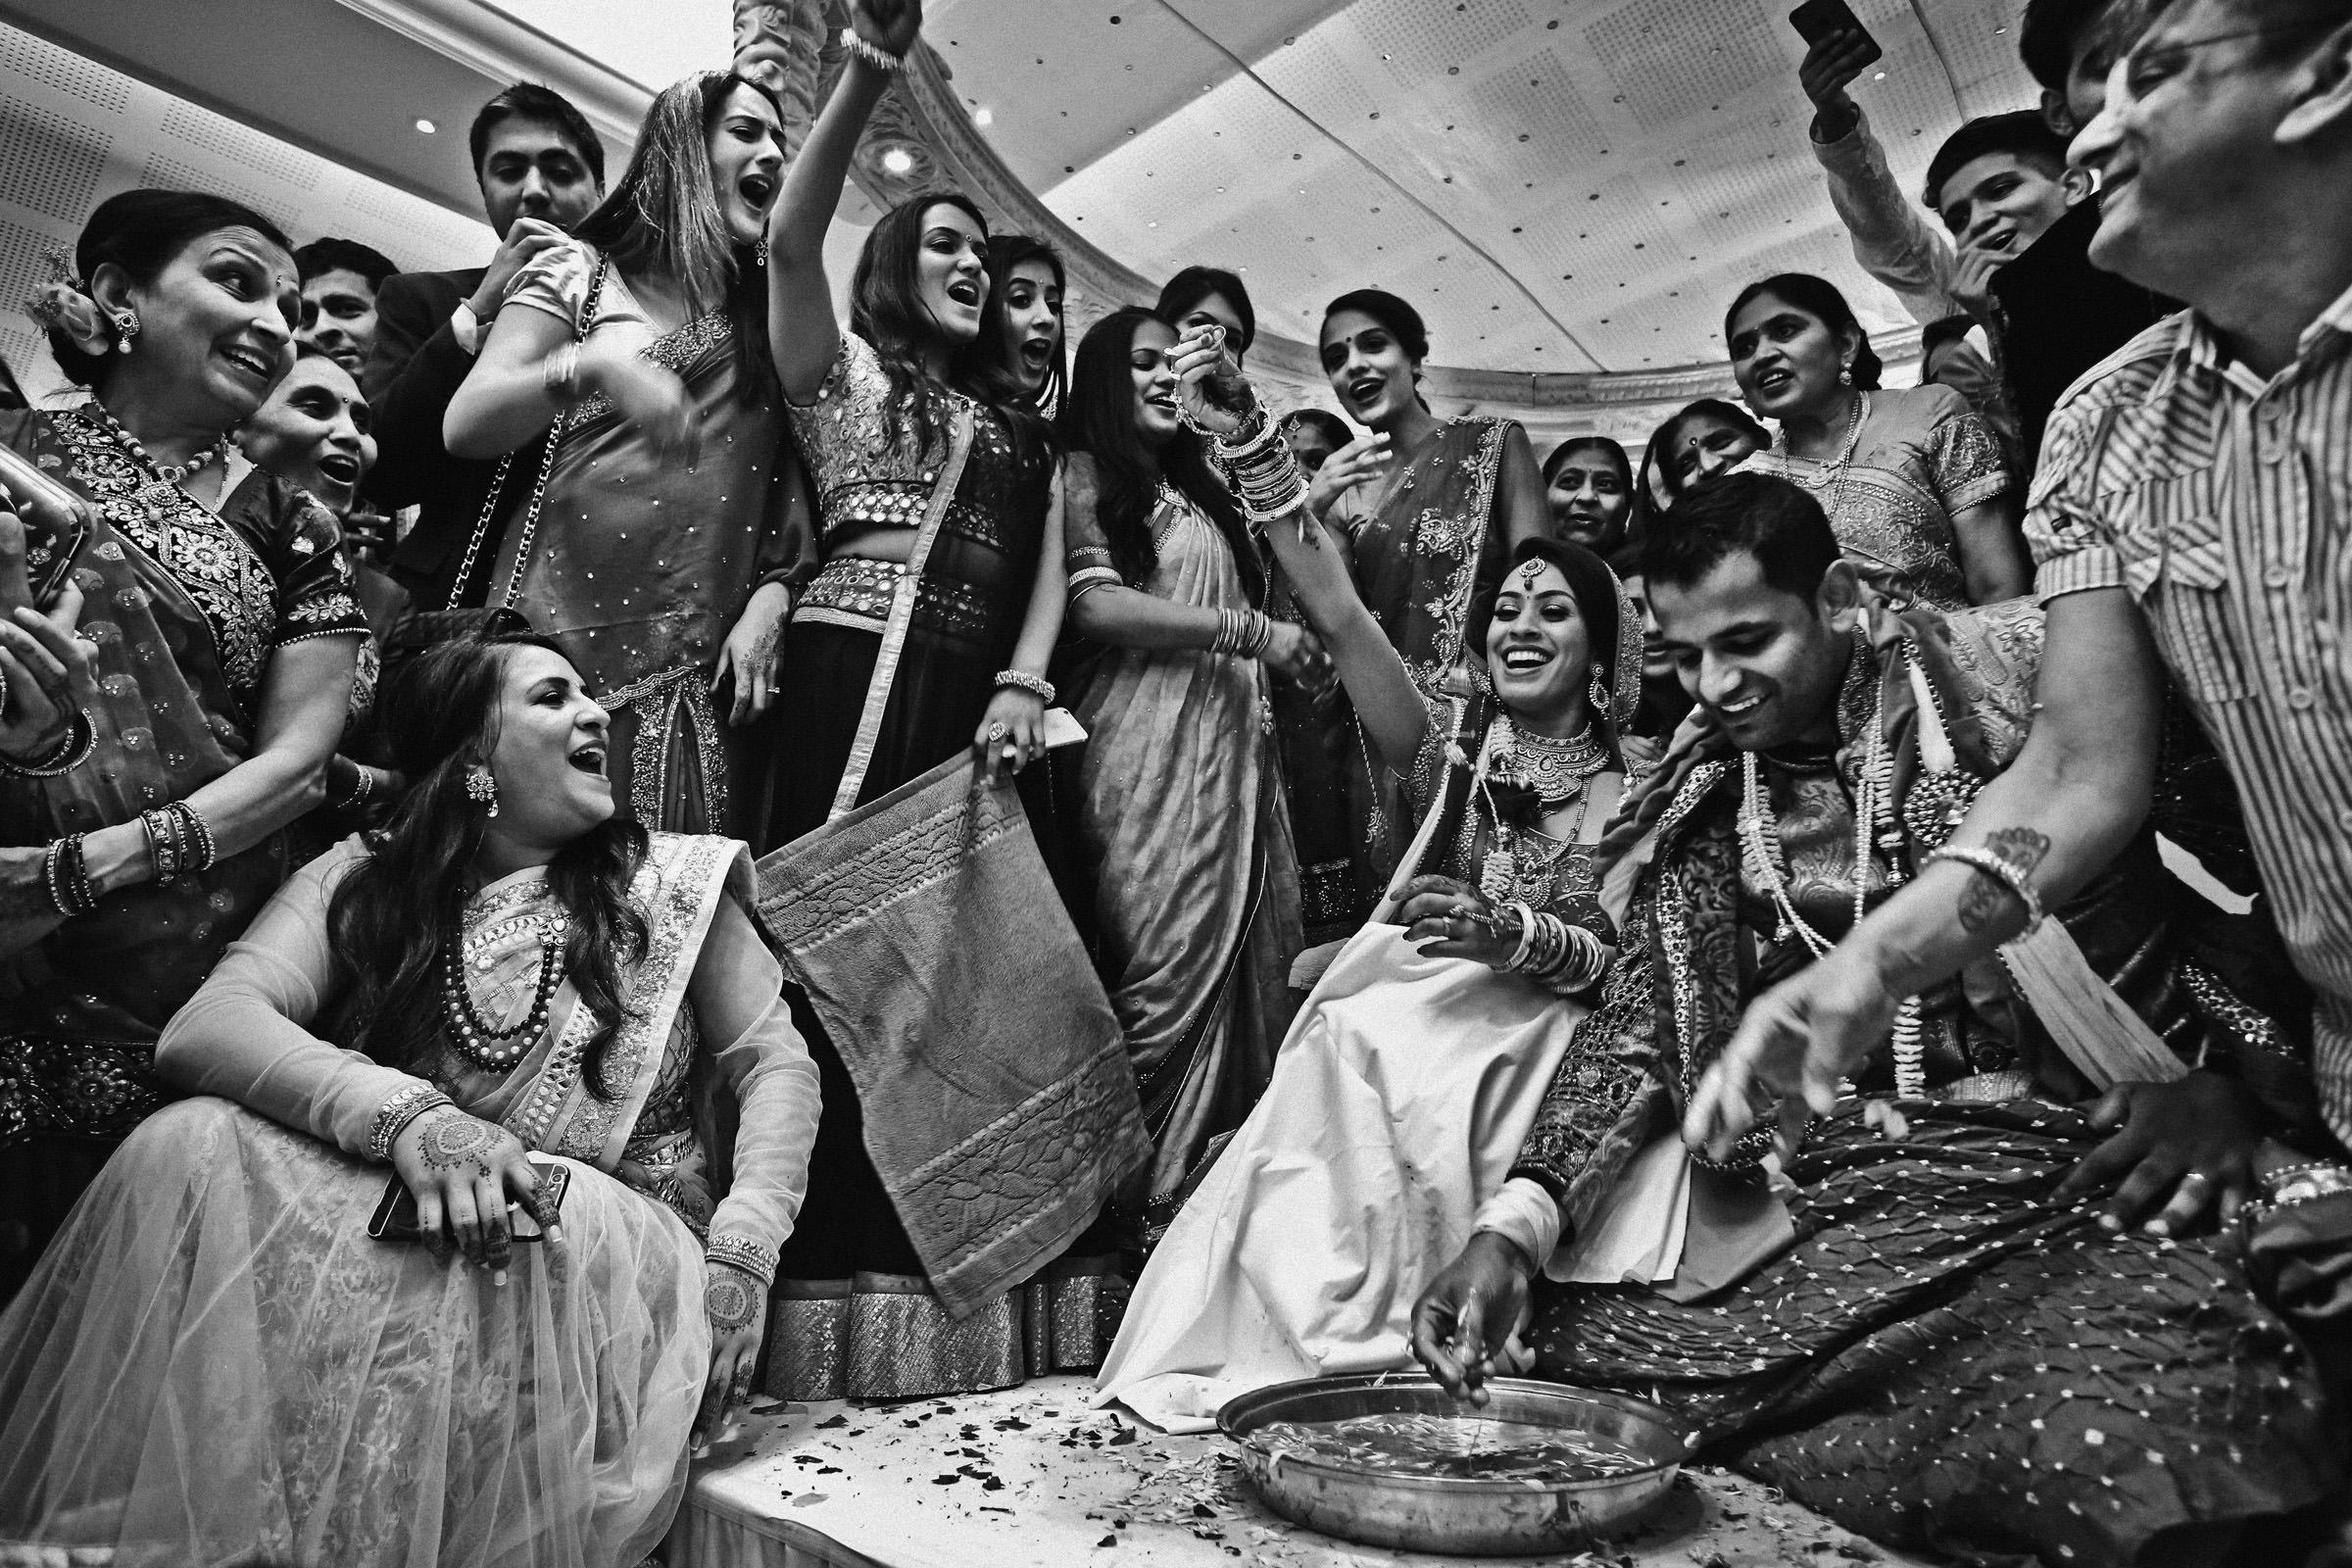 Joyous Indian wedding ceremony, by Franck Boutonnet